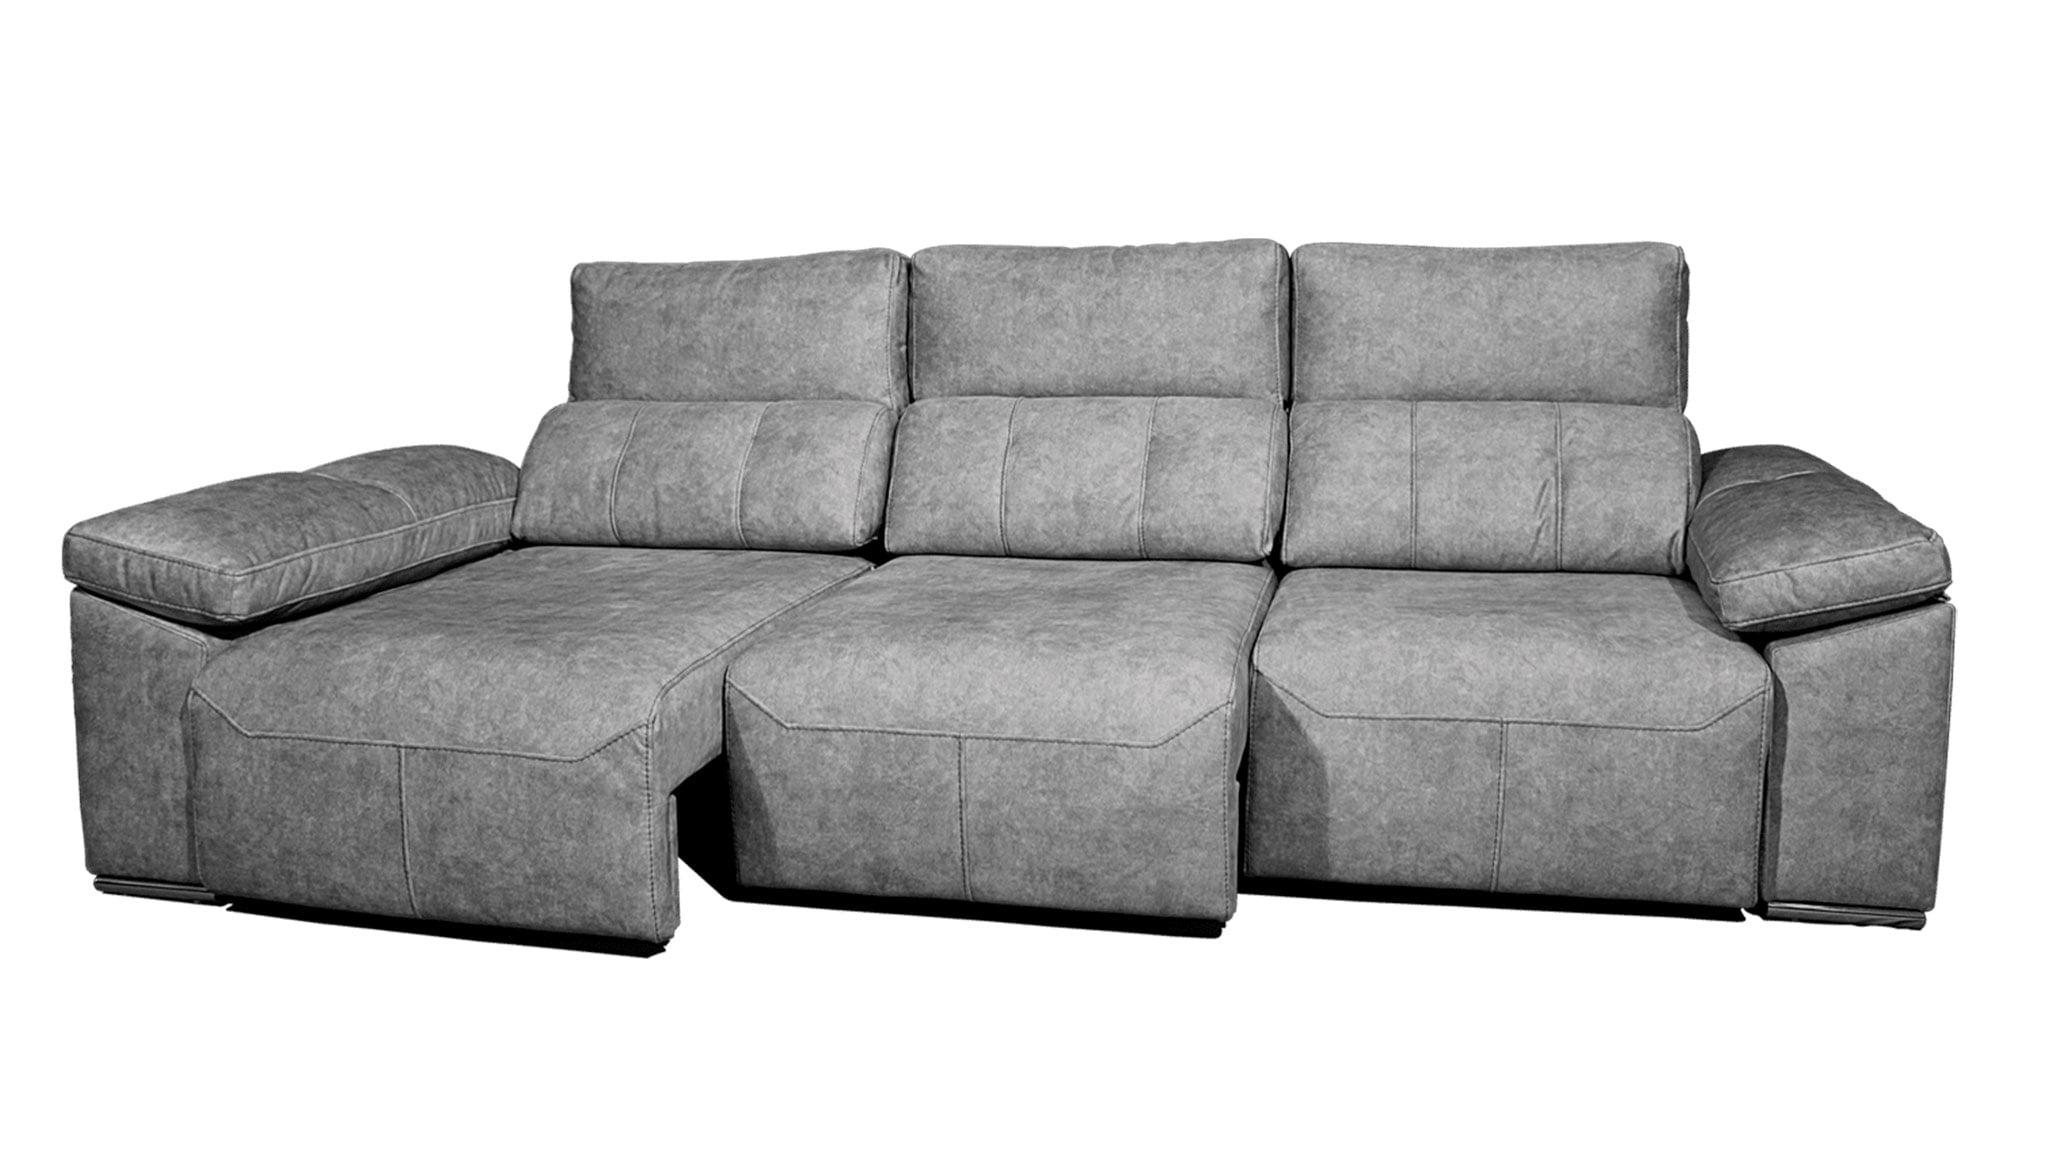 Drago Slide диван - Ок Диваны